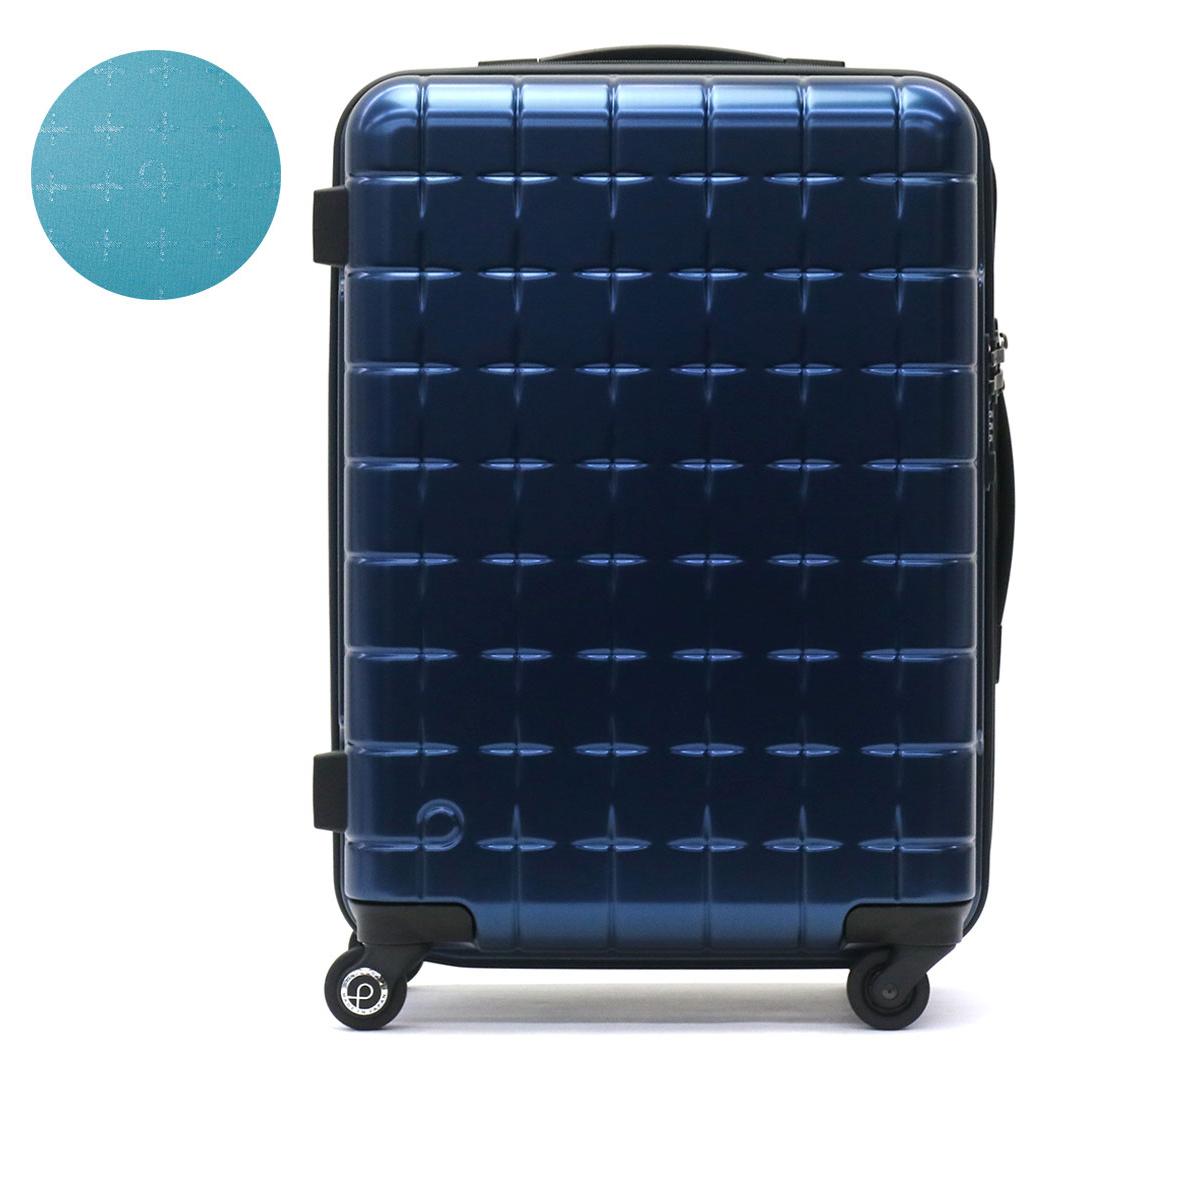 PROTeCA プロテカ 360T METALLIC スリーシックスティT メタリック スーツケース 45L 02932